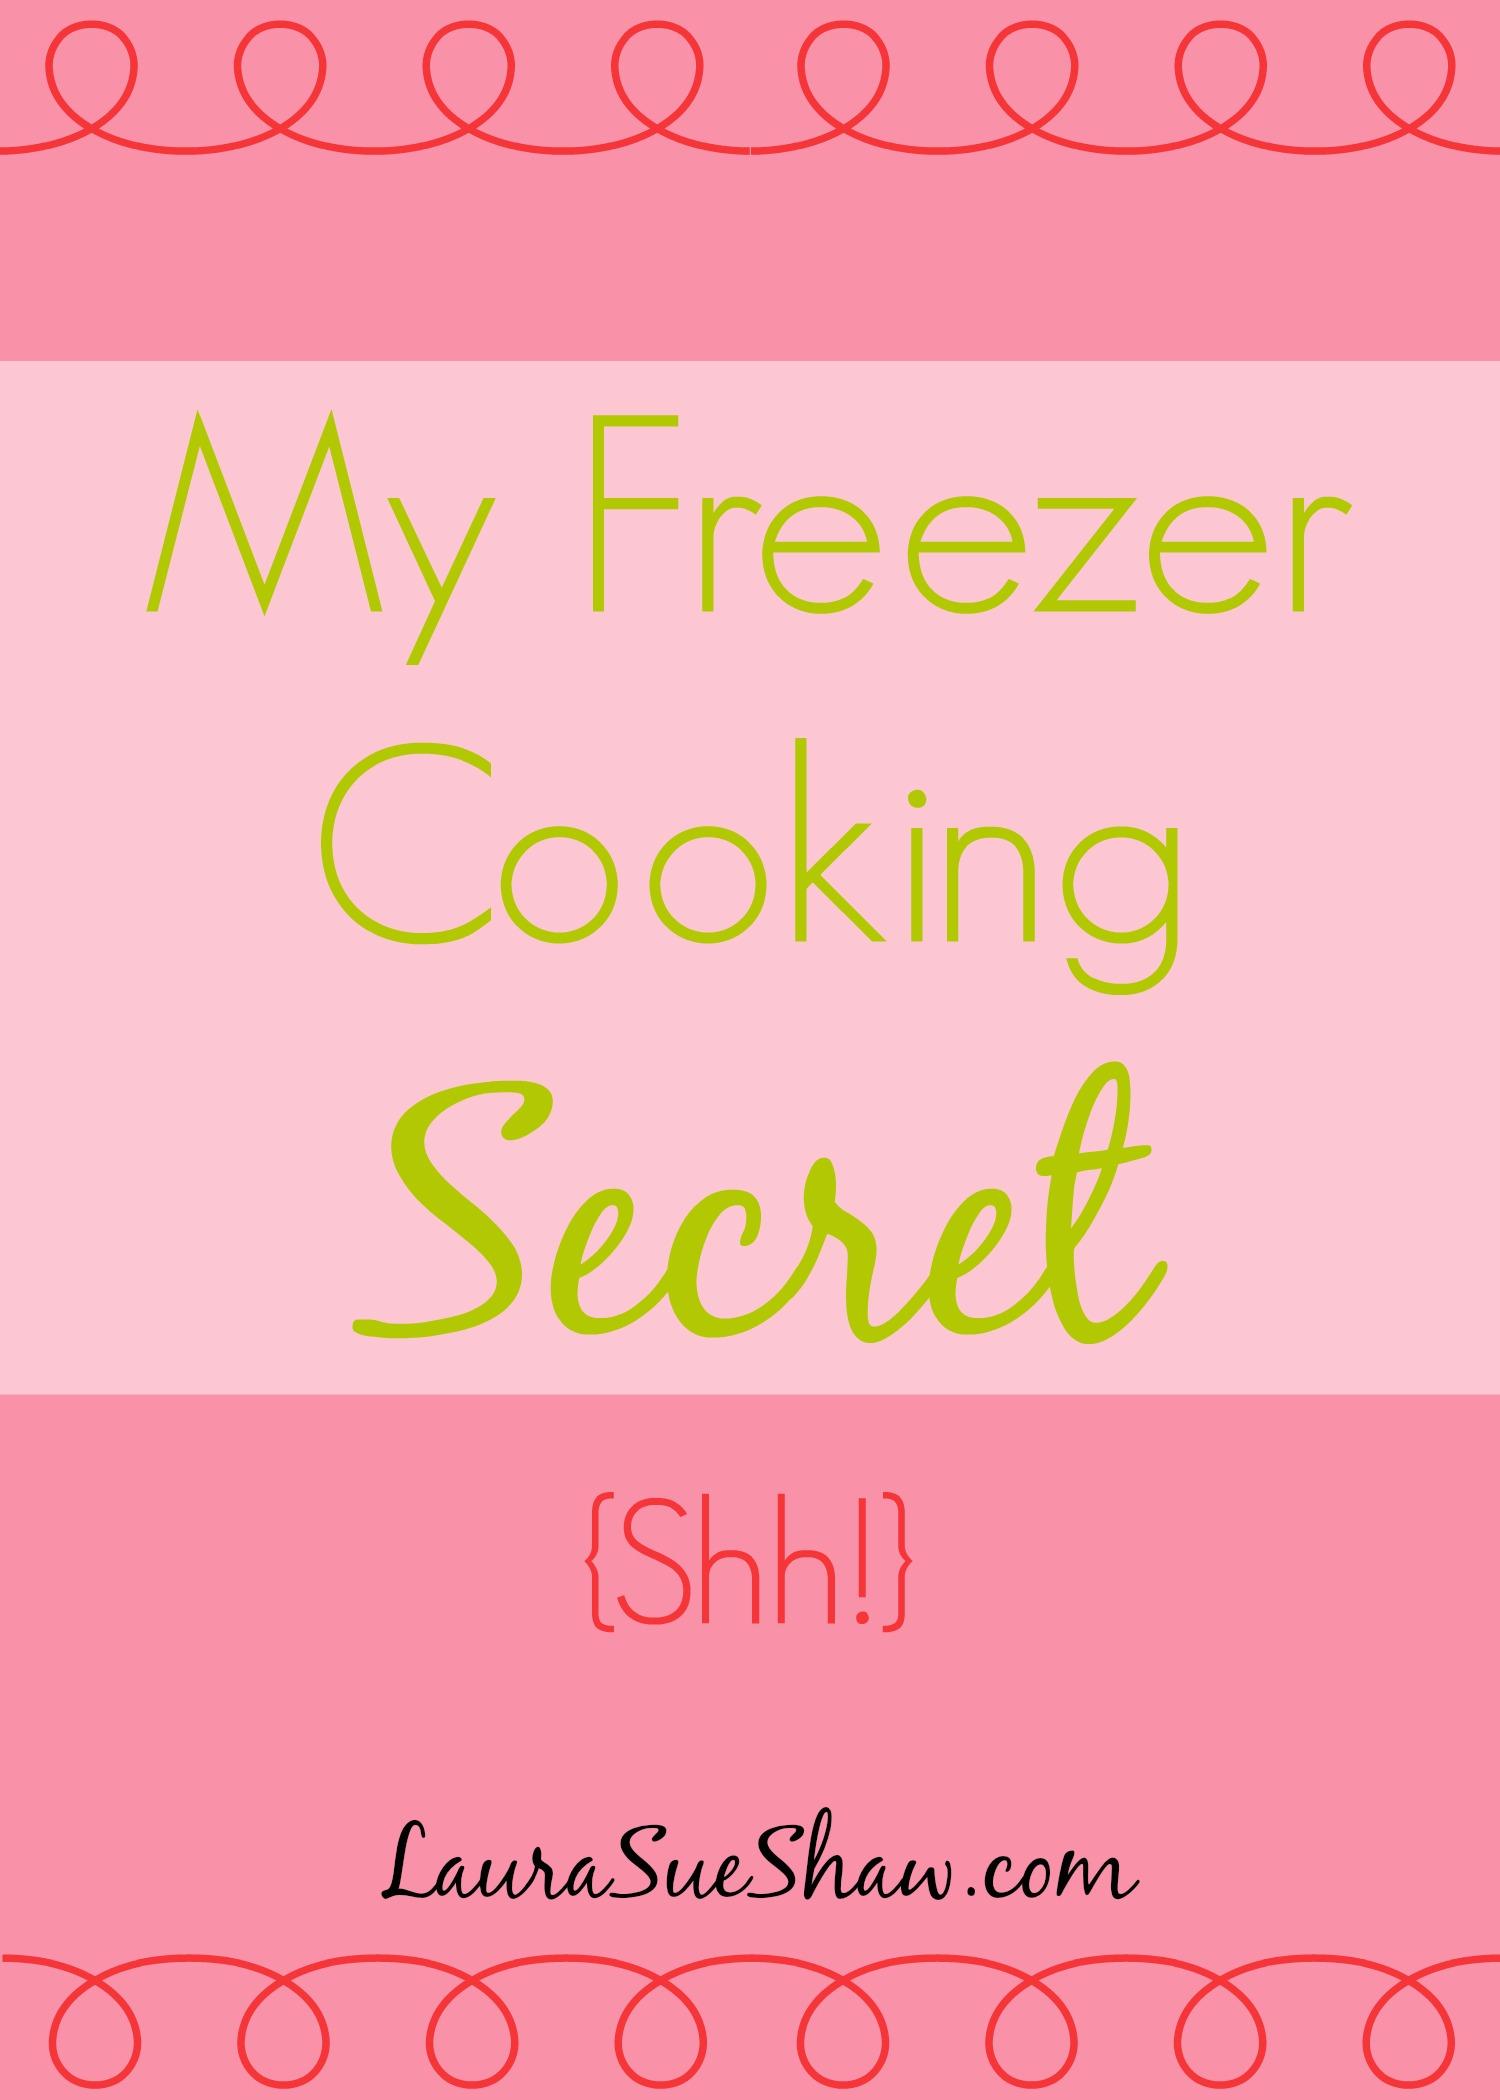 My Freezer Cooking Secret